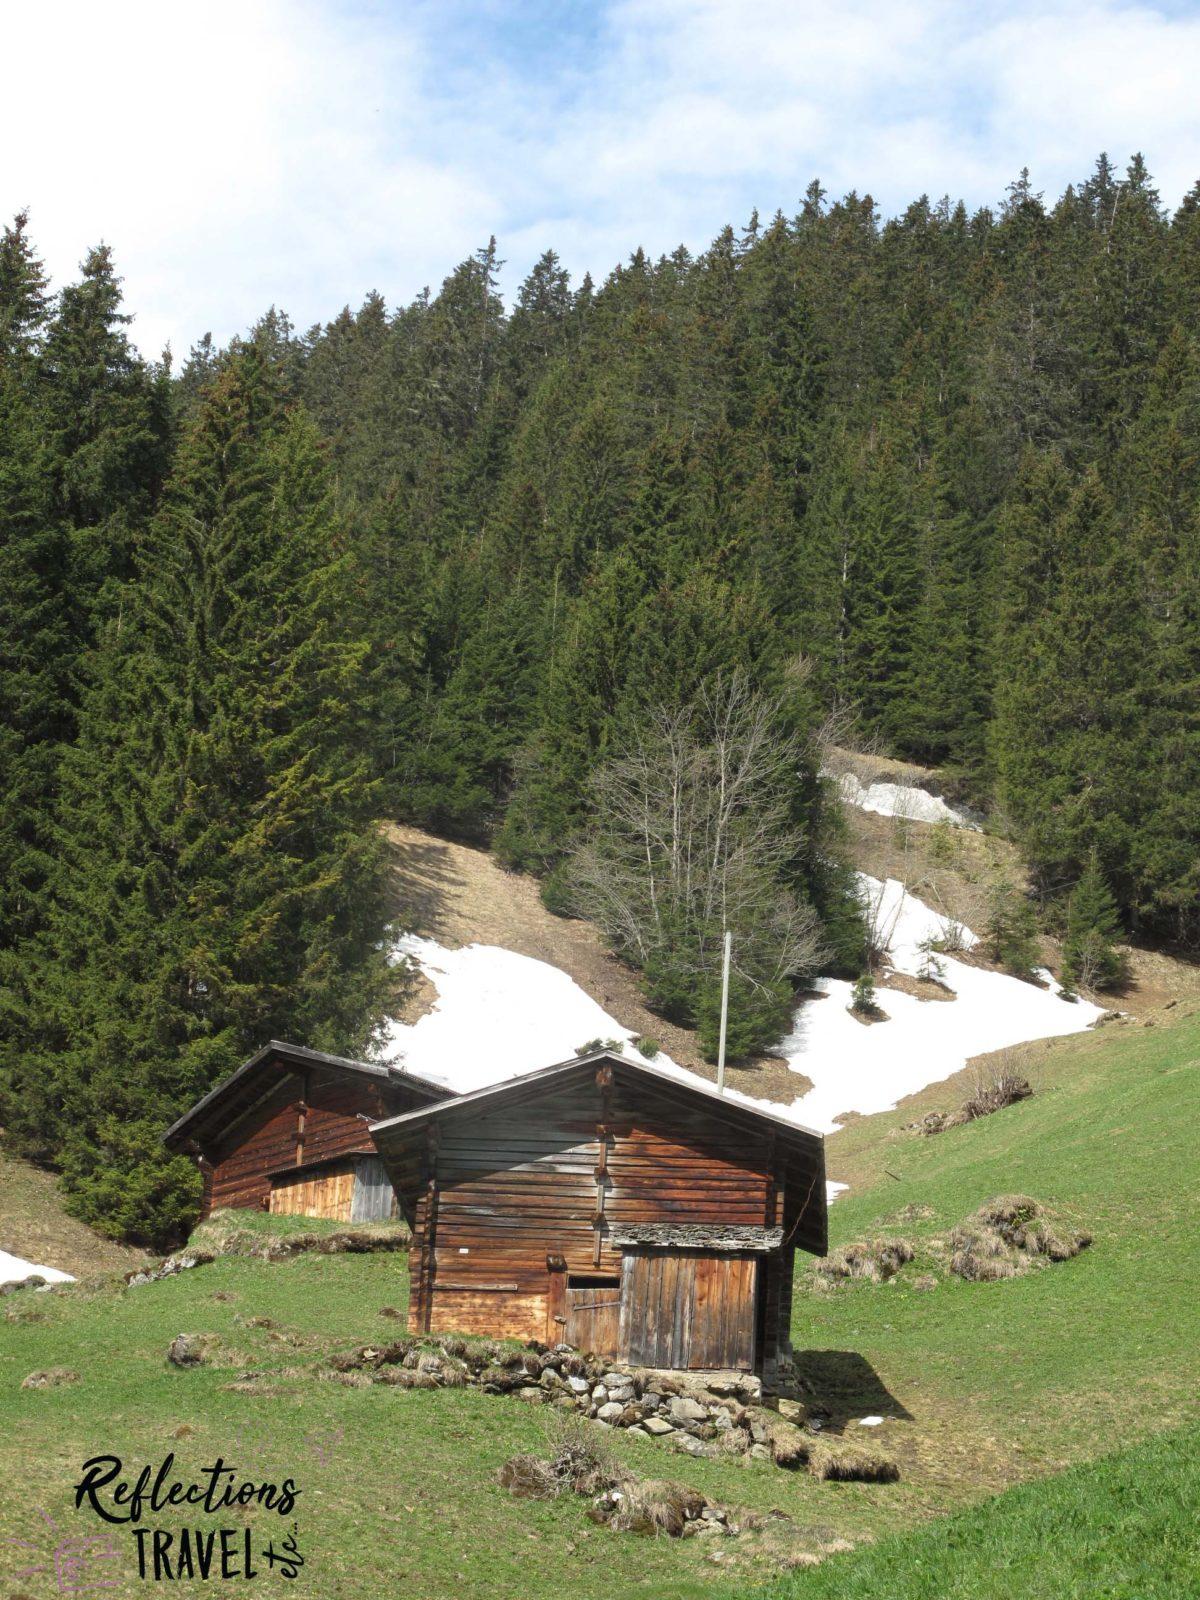 Switzerland: Scenery and Food